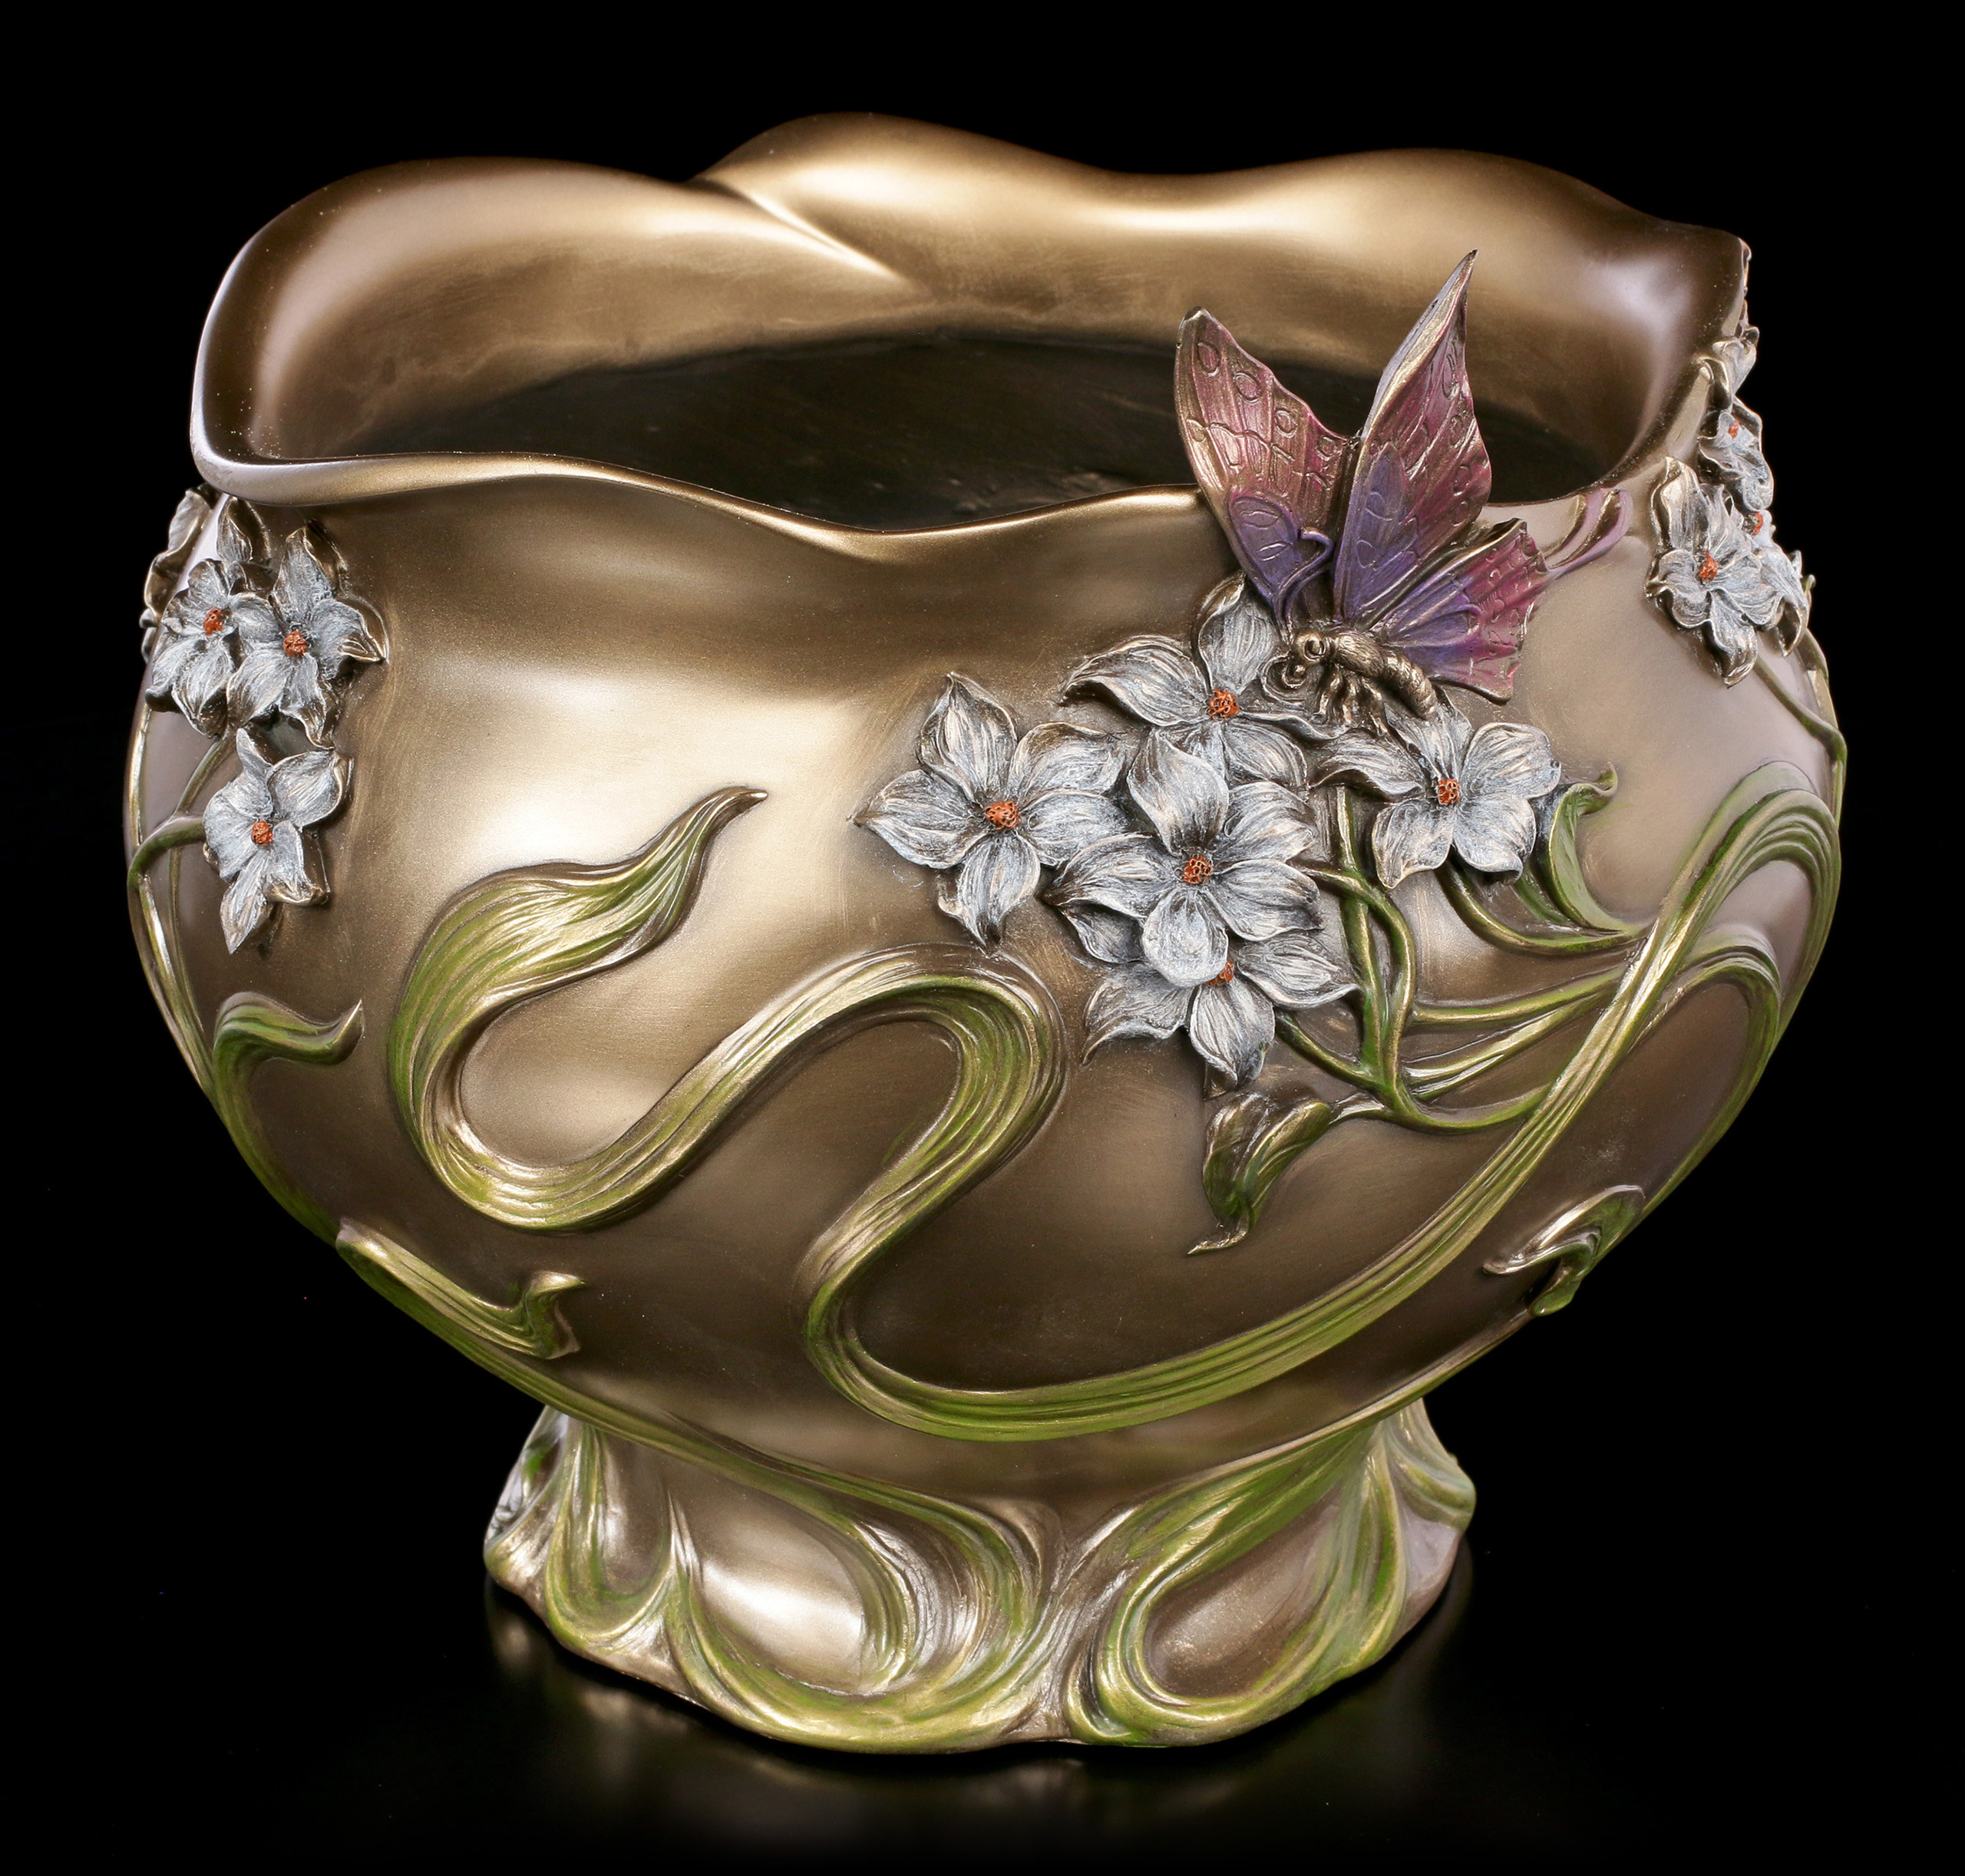 art nouveau pottery vase of art nouveau flower pot butterfly www figuren shop de for jugendstil blumen vase schmetterling